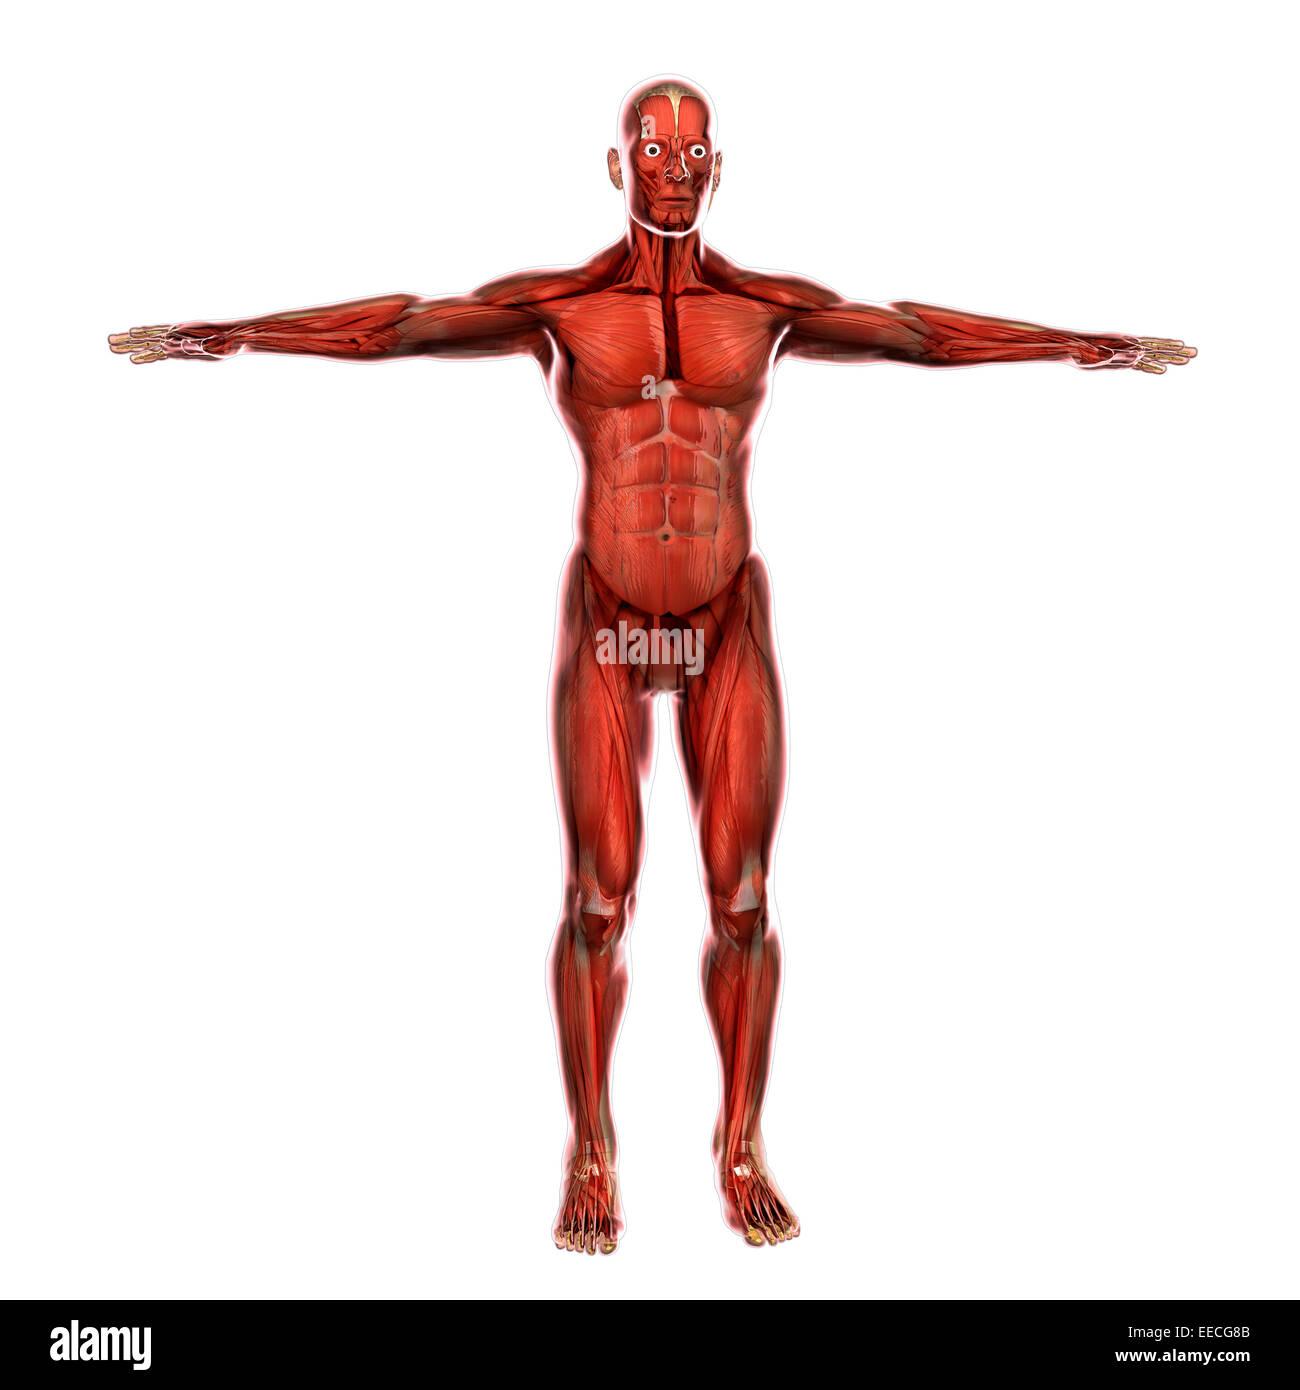 Human Muscular System Stock Photo 77722859 Alamy